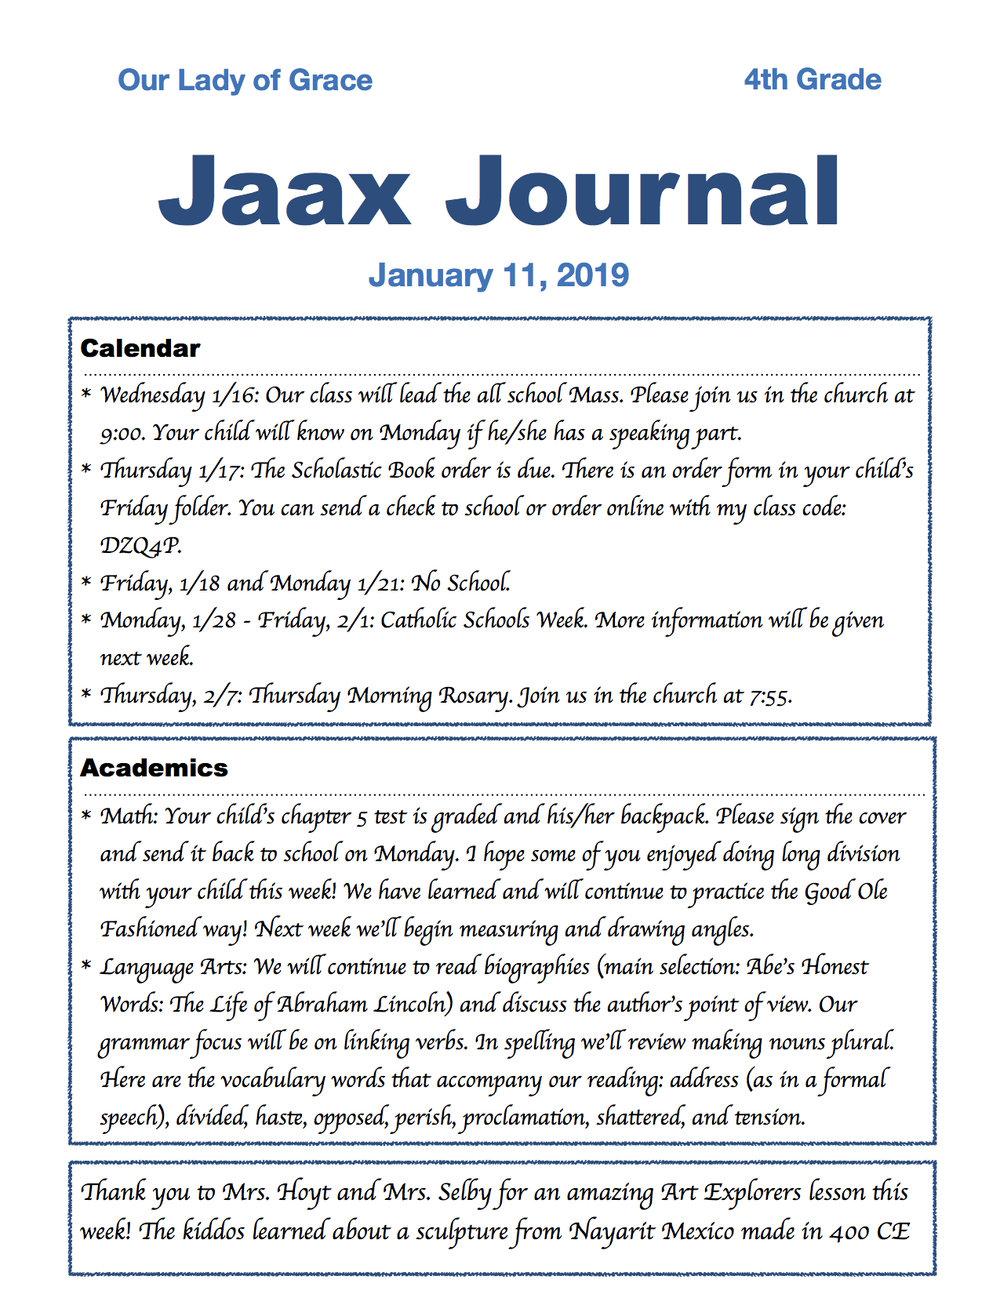 JaaxJournal1-11-19.jpg